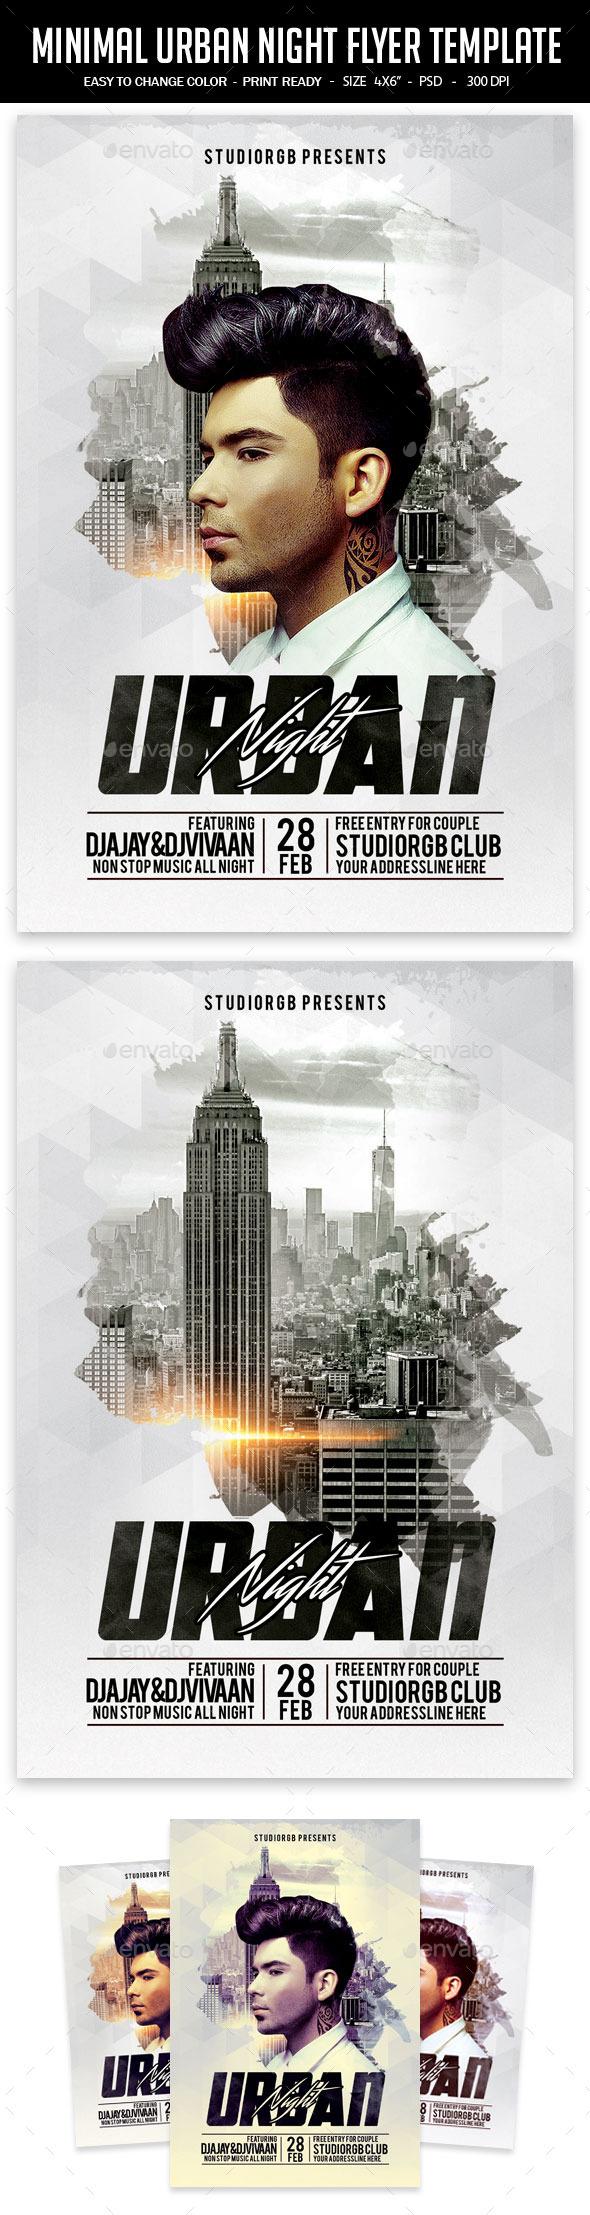 GraphicRiver Minimal Urban Night Flyer Template 11834165